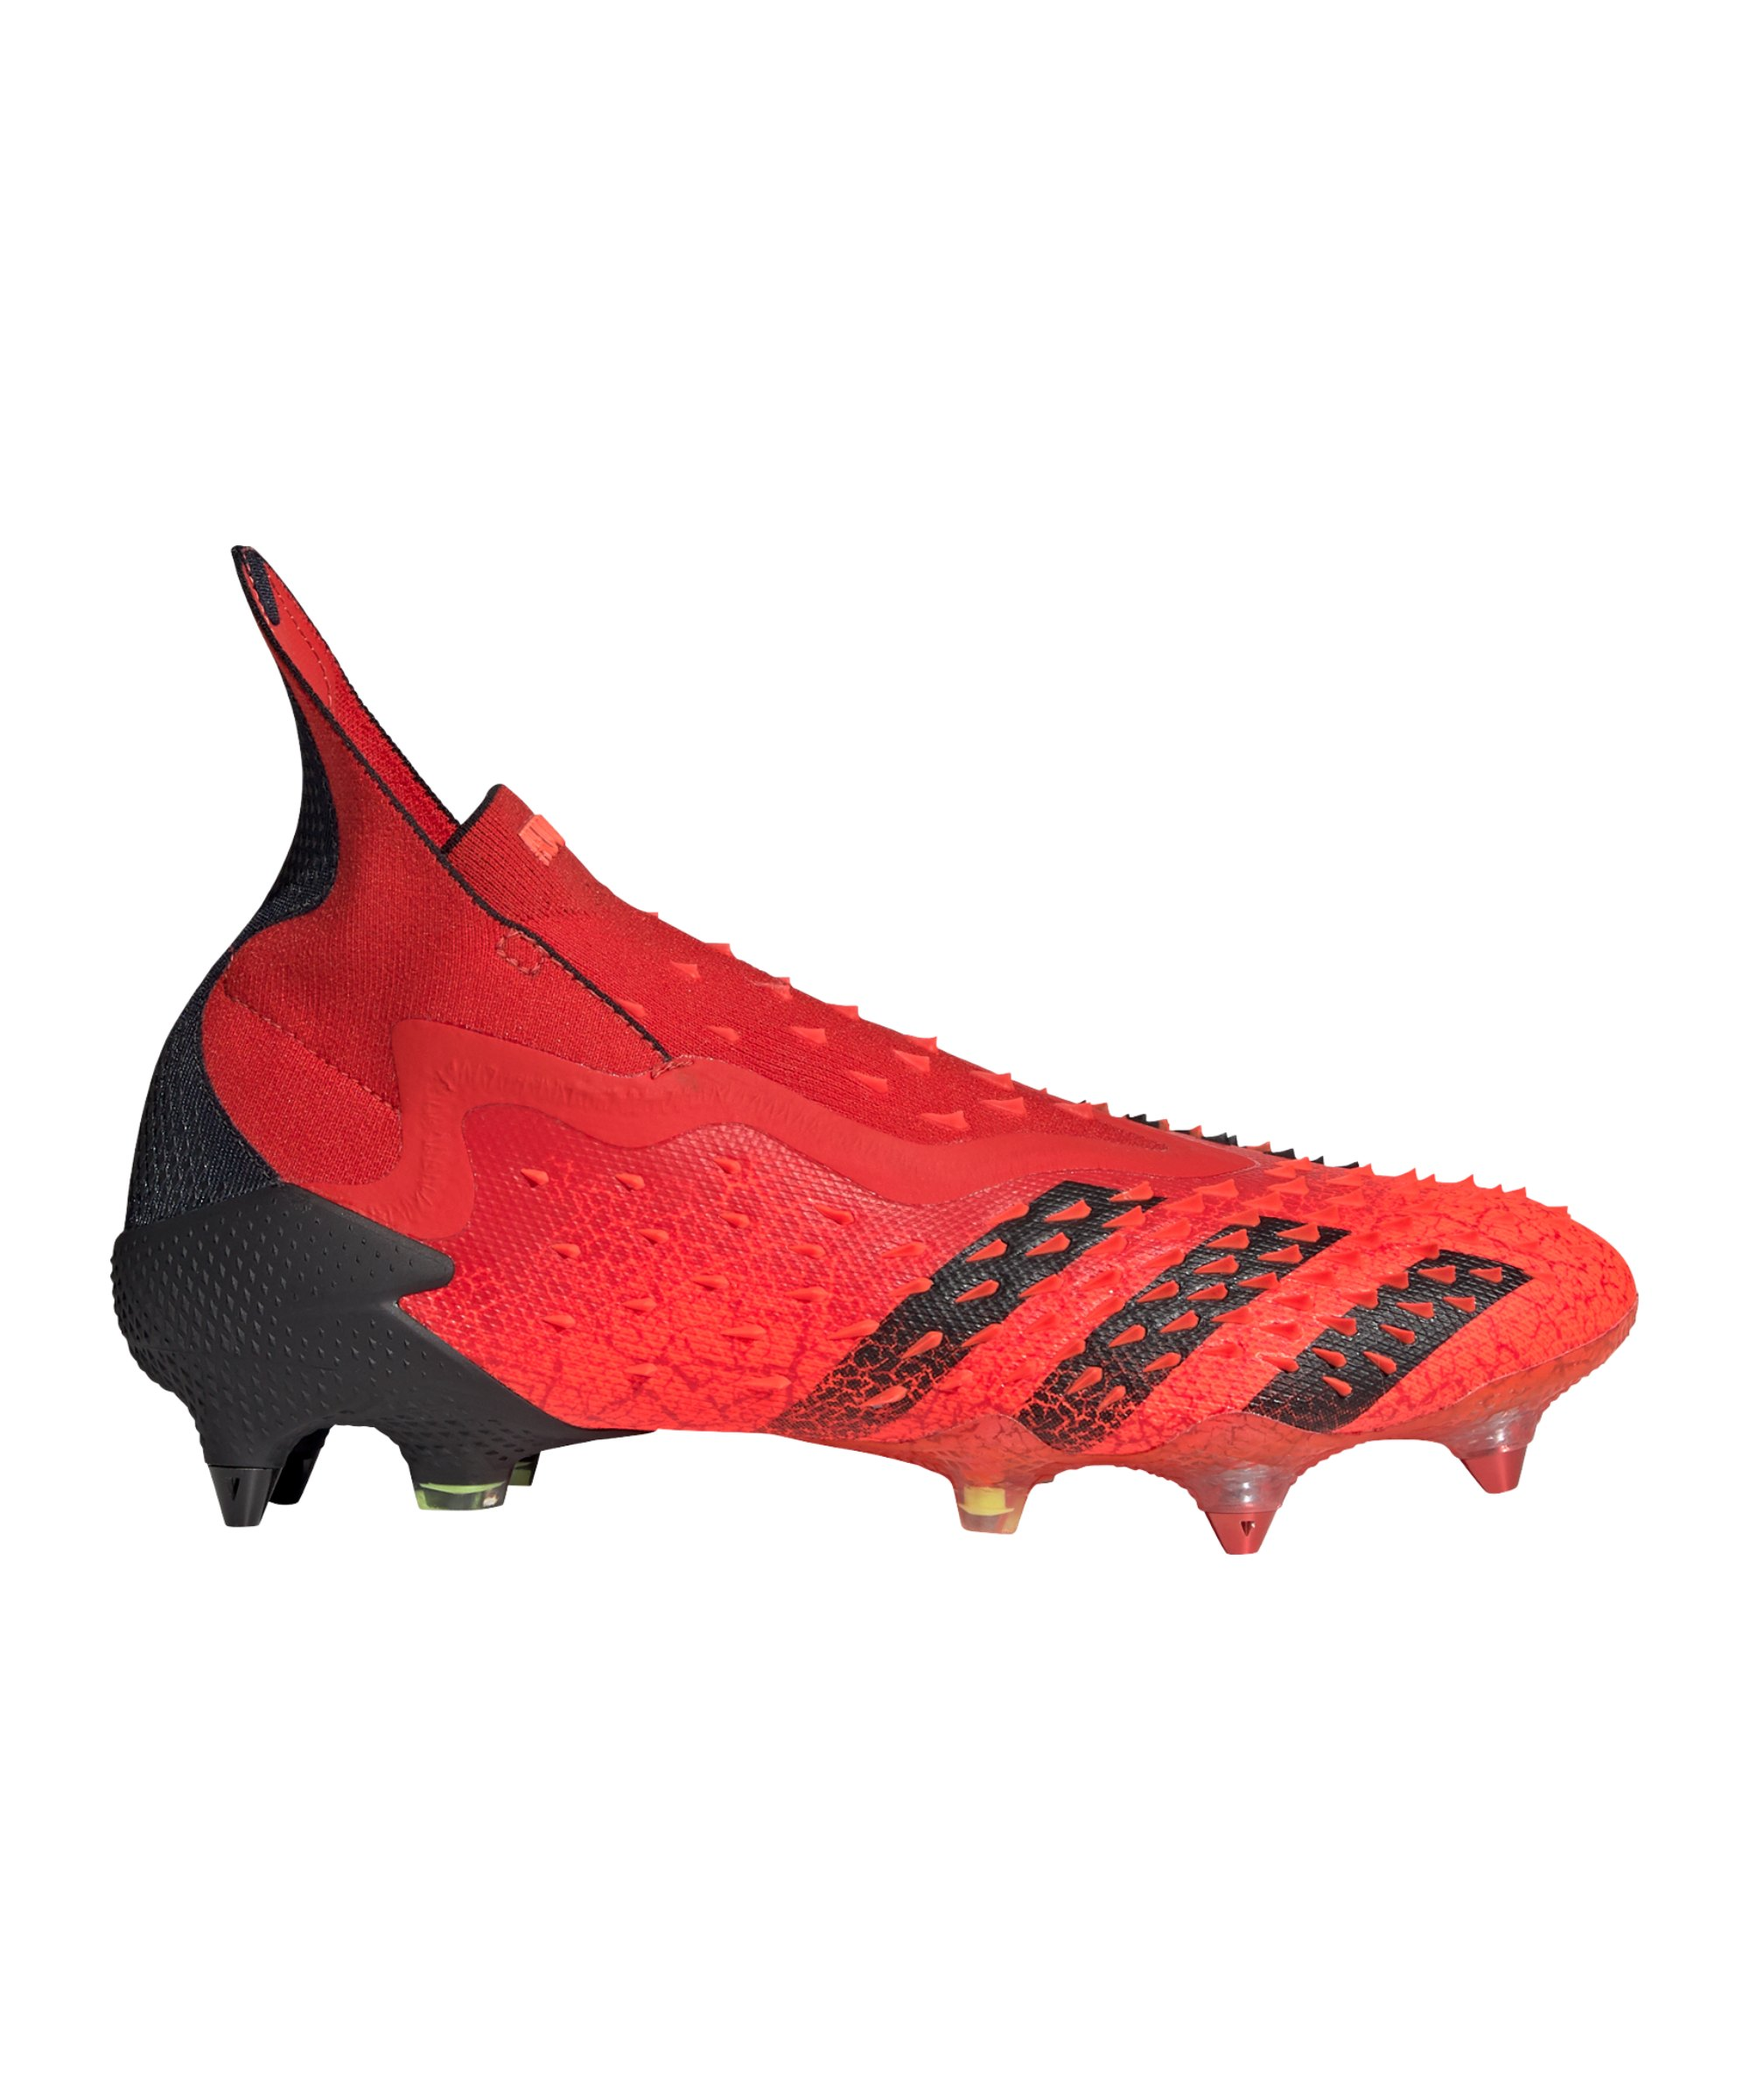 adidas Predator FREAK+ SG Meteorite Rot Schwarz - rot